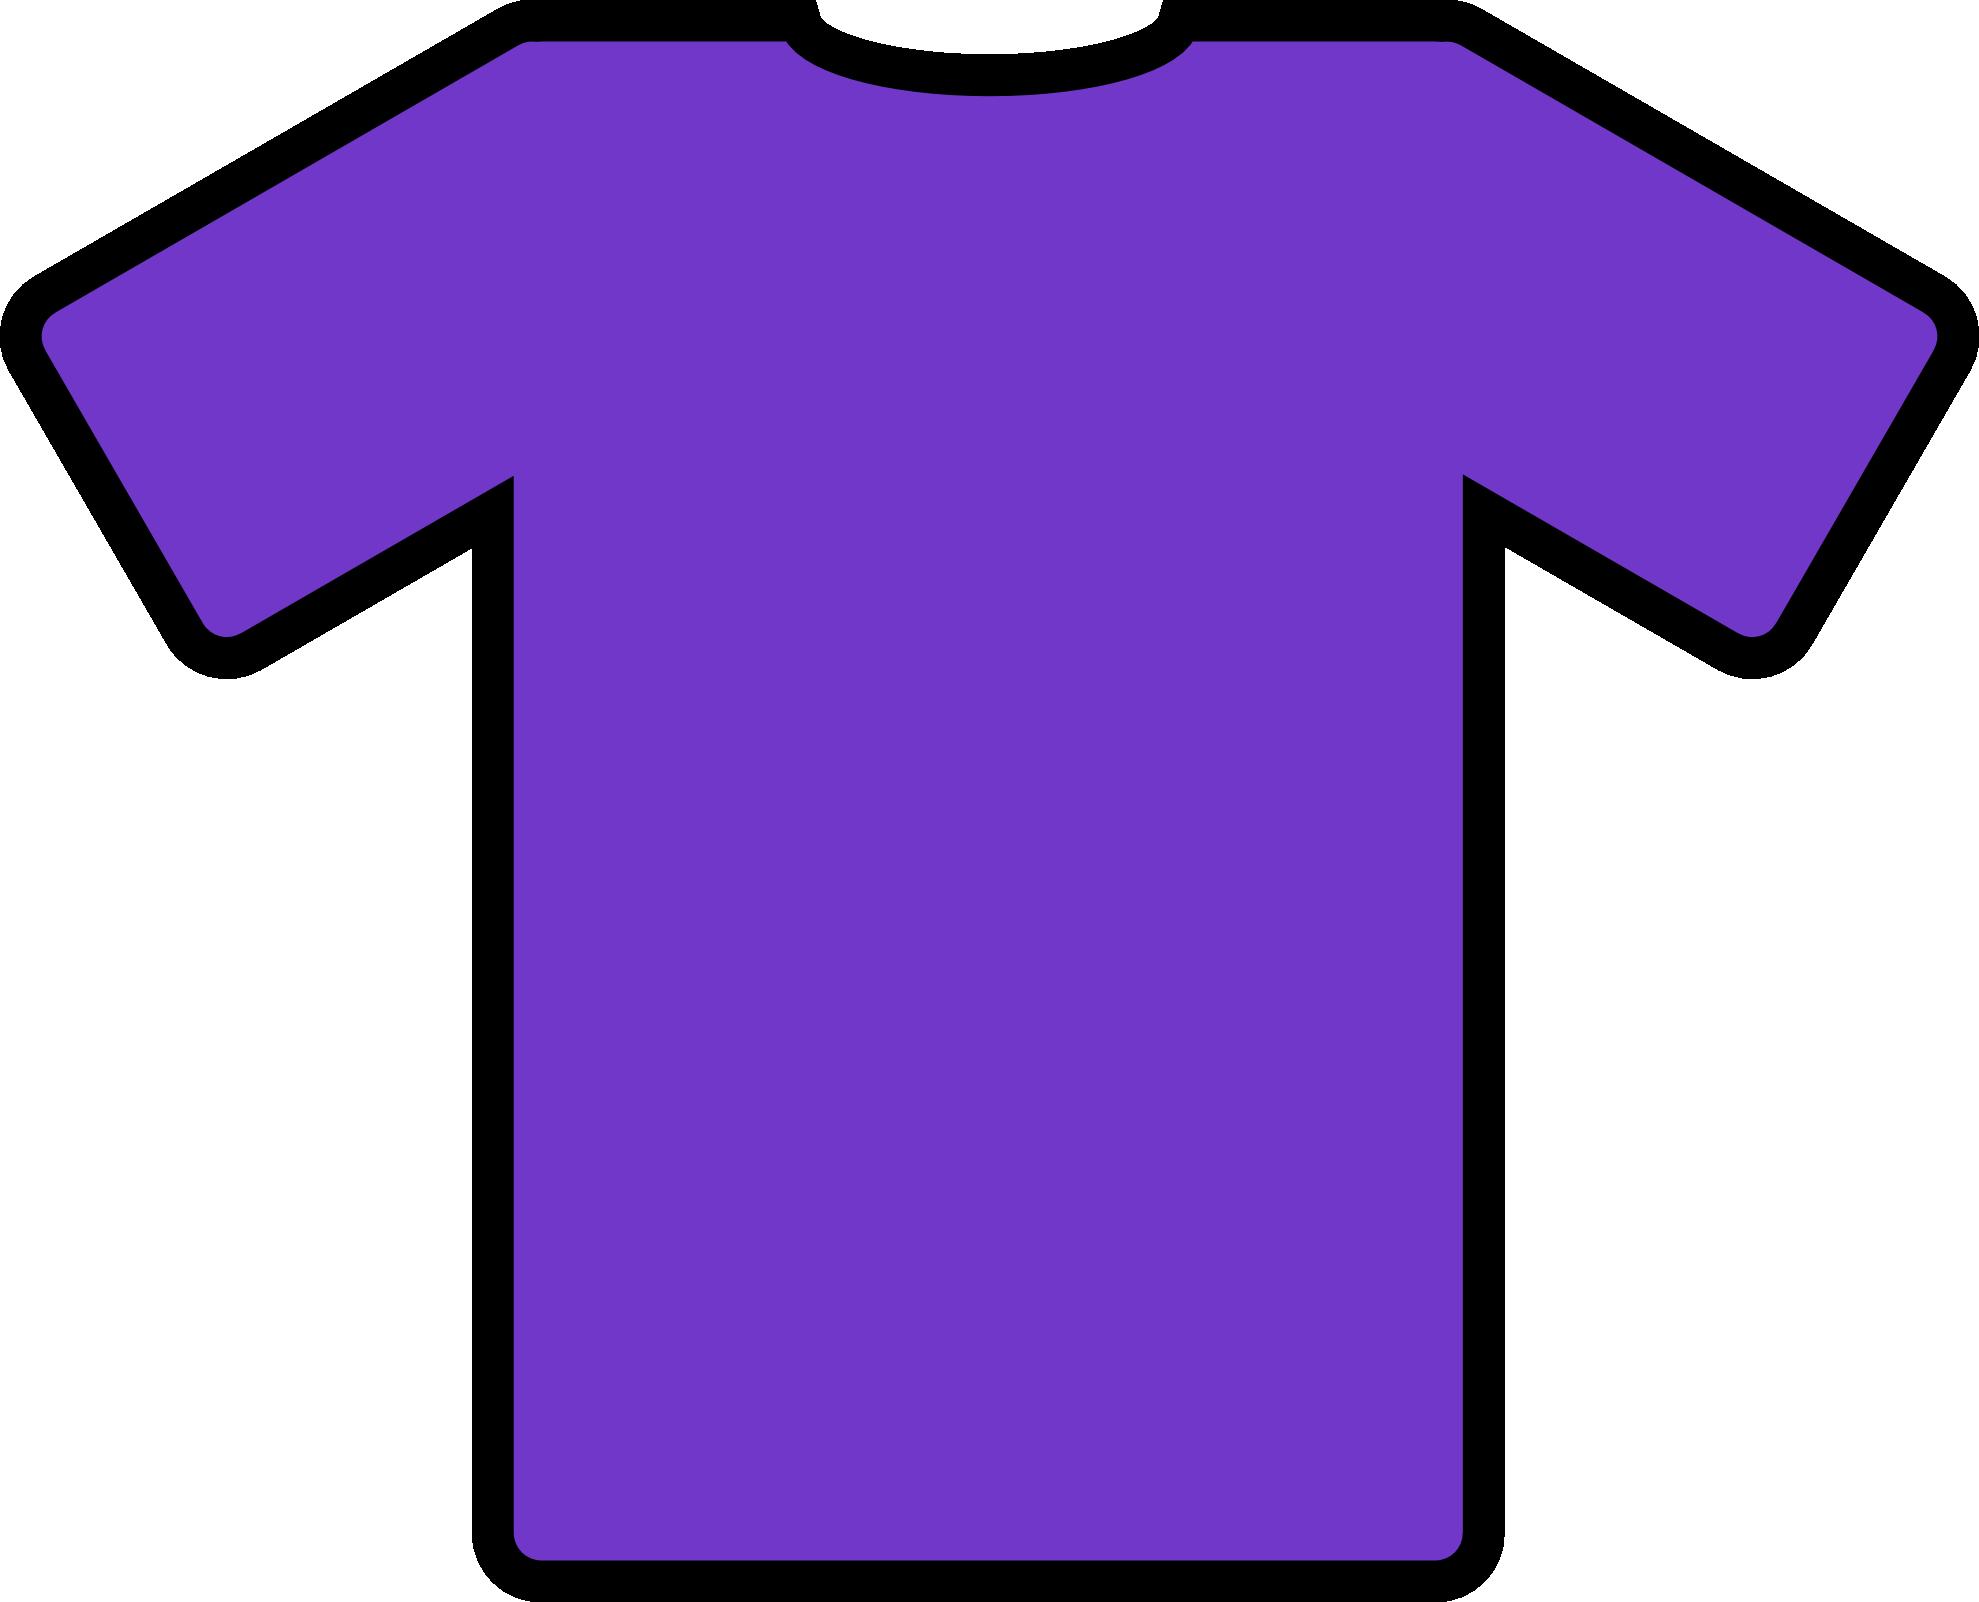 Blank football jersey clipart svg freeuse 28+ Collection of Purple Football Jersey Clipart | High quality ... svg freeuse